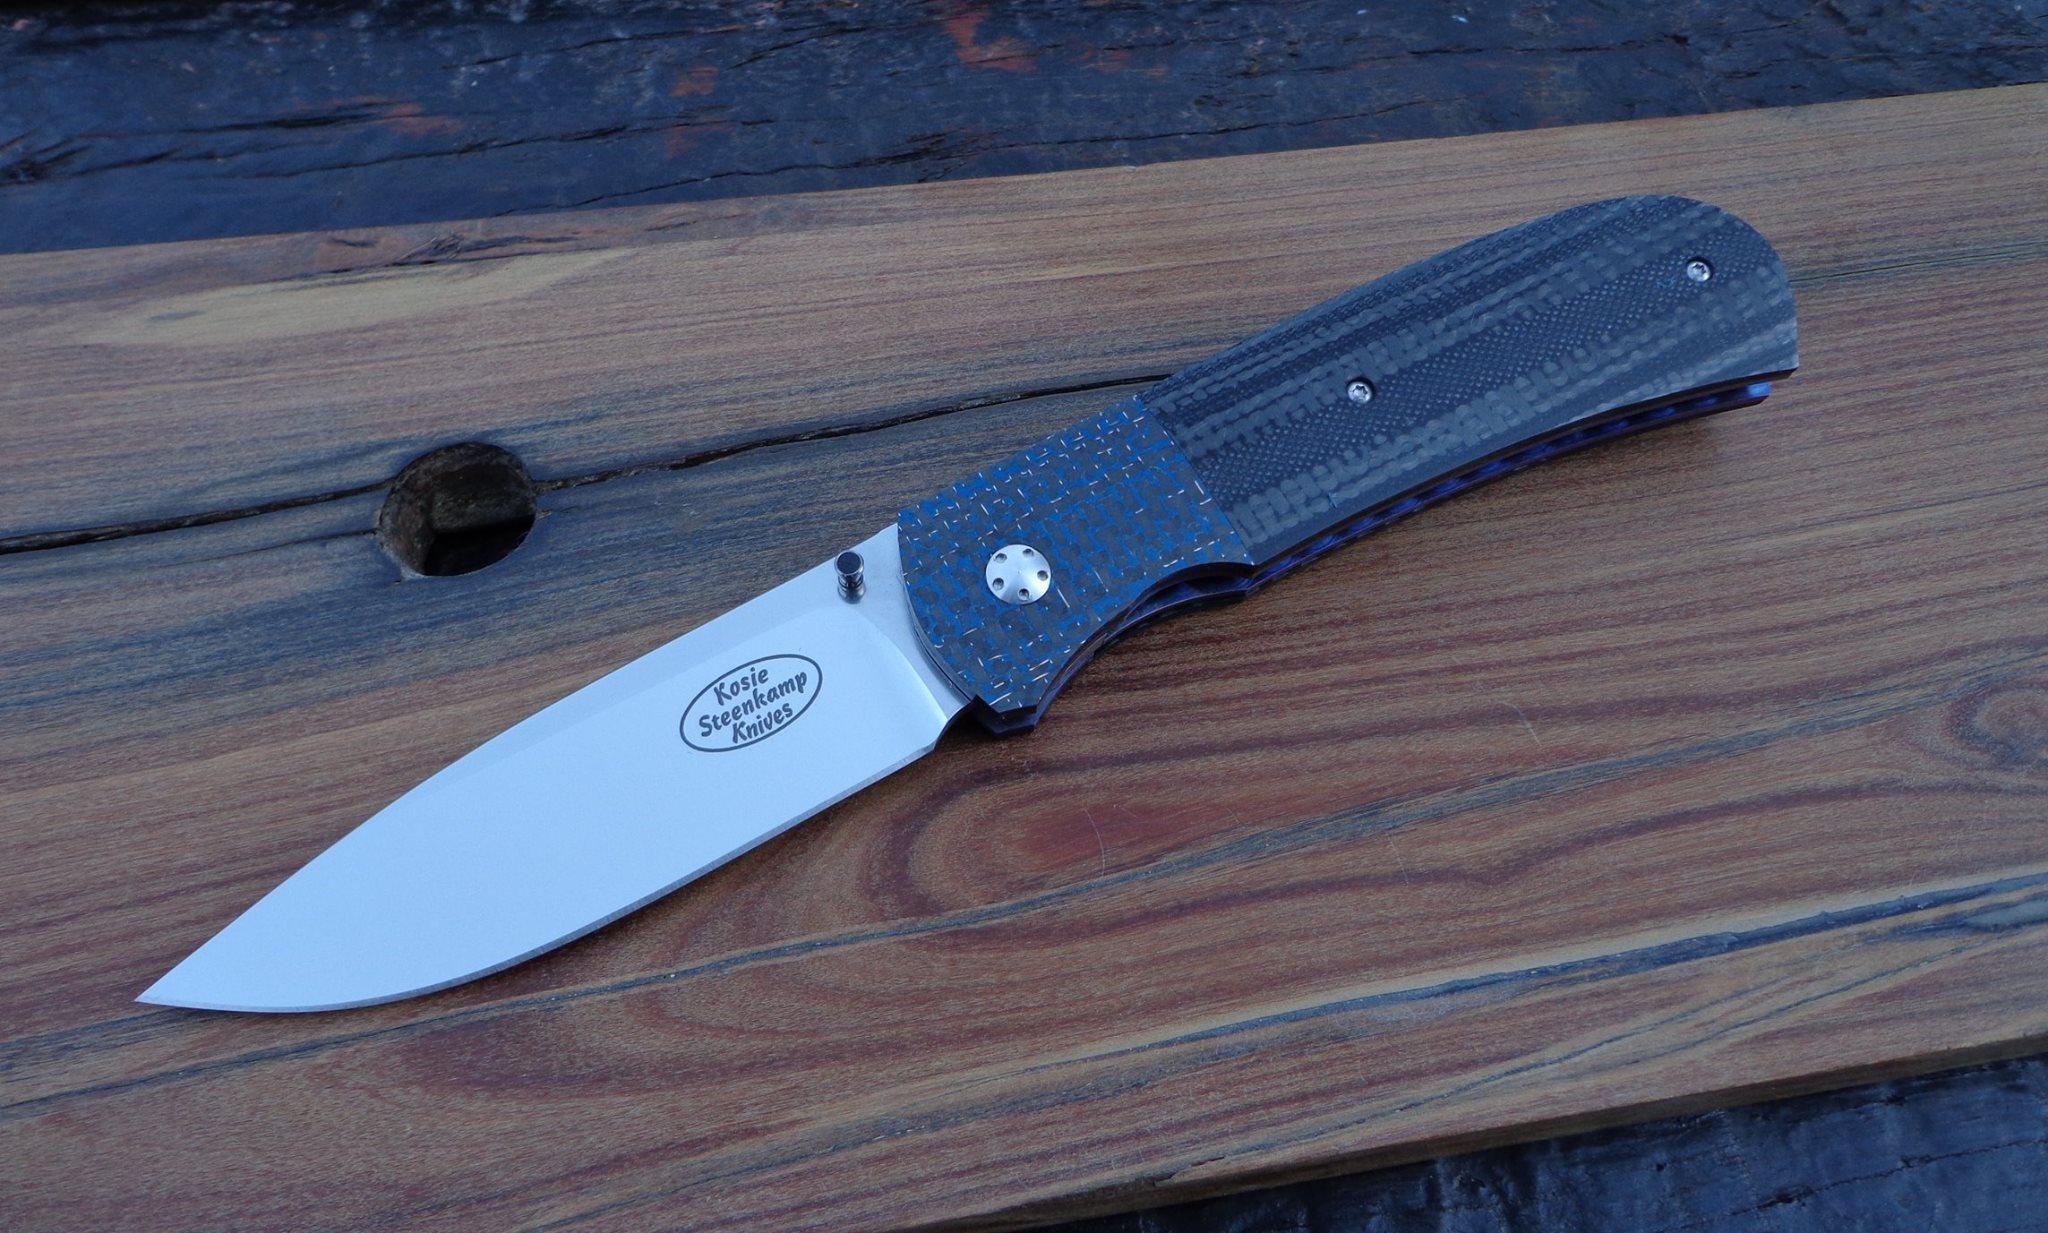 Knife: Sakson II. Blade: Böhler N690 Stainless Steel. Liners: Titanium, anodized blue. Handle scales: G10 + Carbon Fibre and Lightning Strike Carbon Fibre with anodized Titanium belt clip.